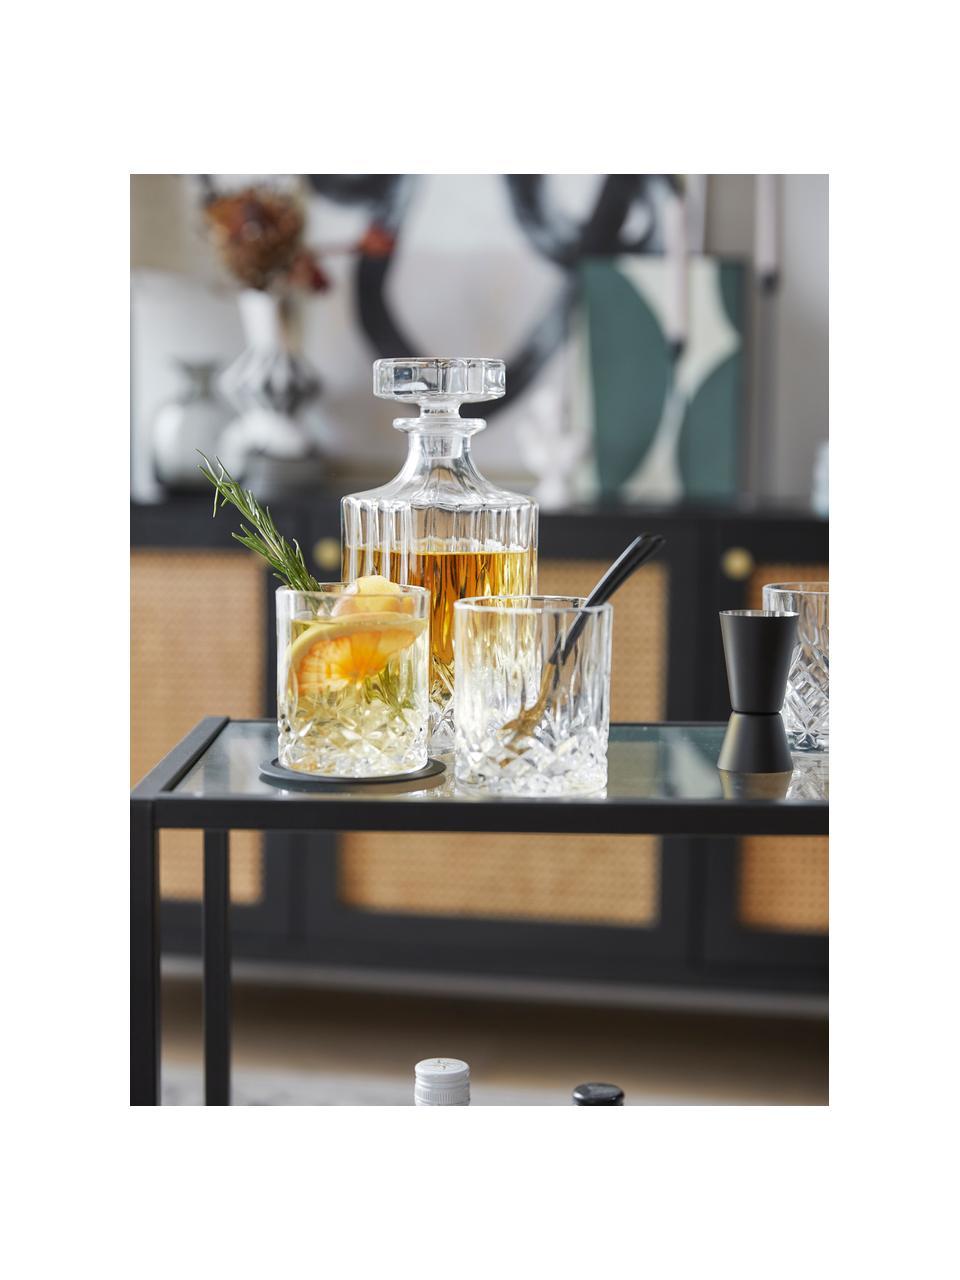 Whiskyset George met kristalreliëf, 3-delig, Glas, Transparant, Set met verschillende formaten